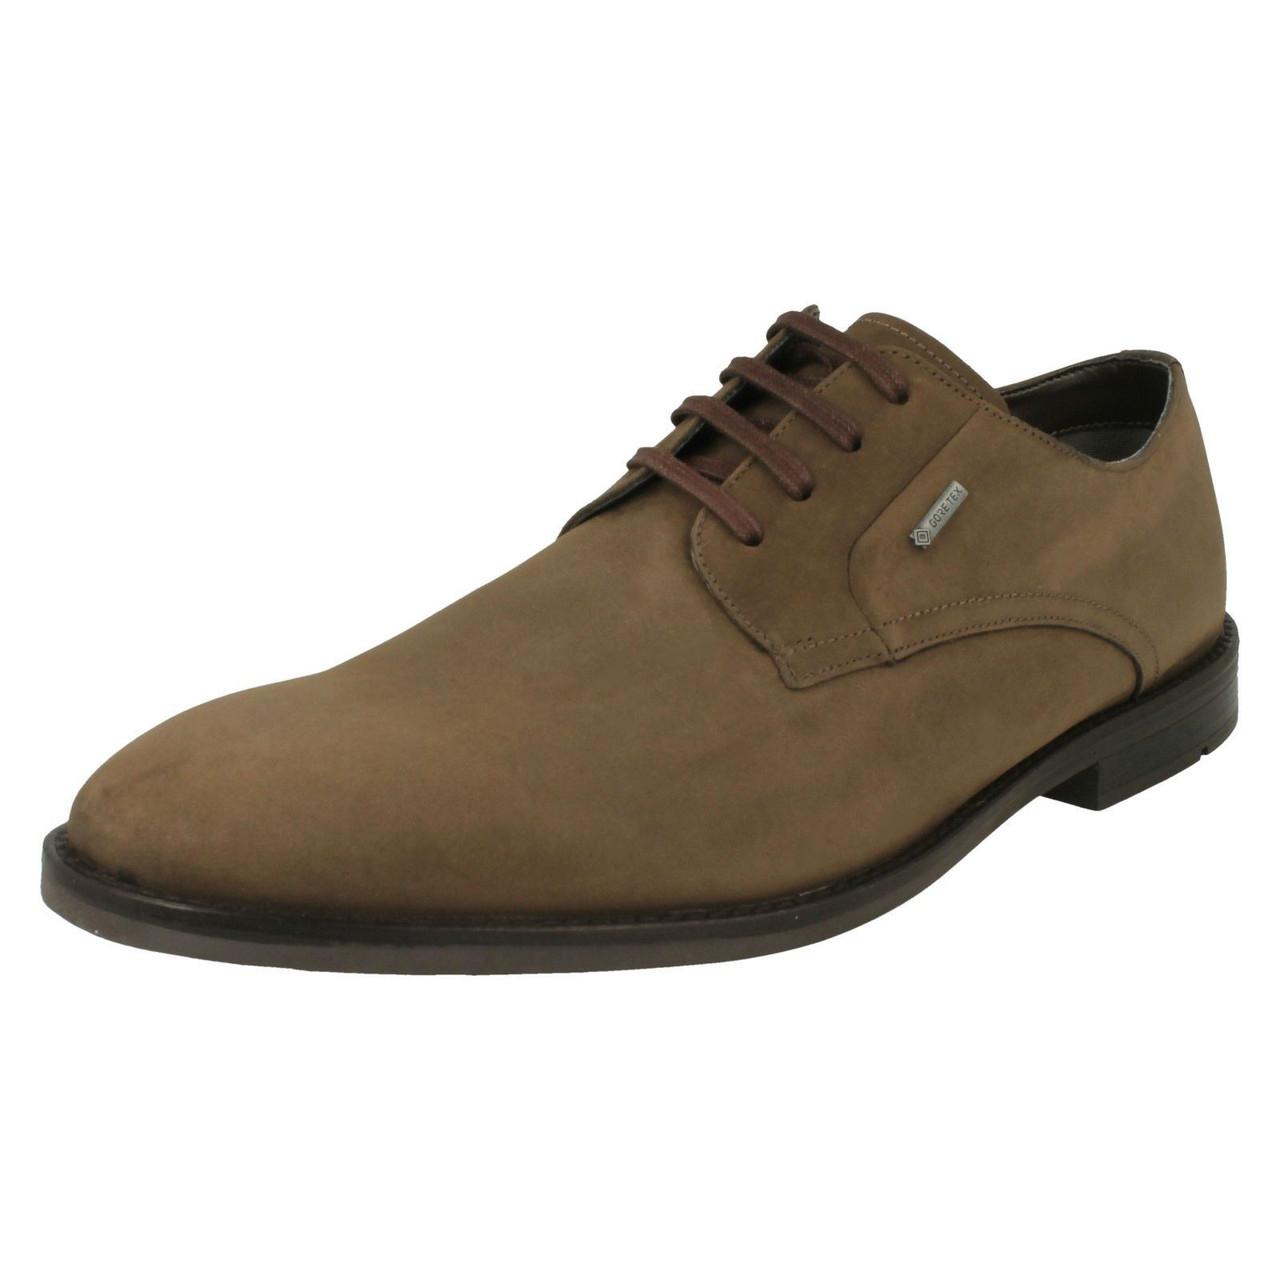 Mens Clarks Gore-Tex Lace Up Shoes